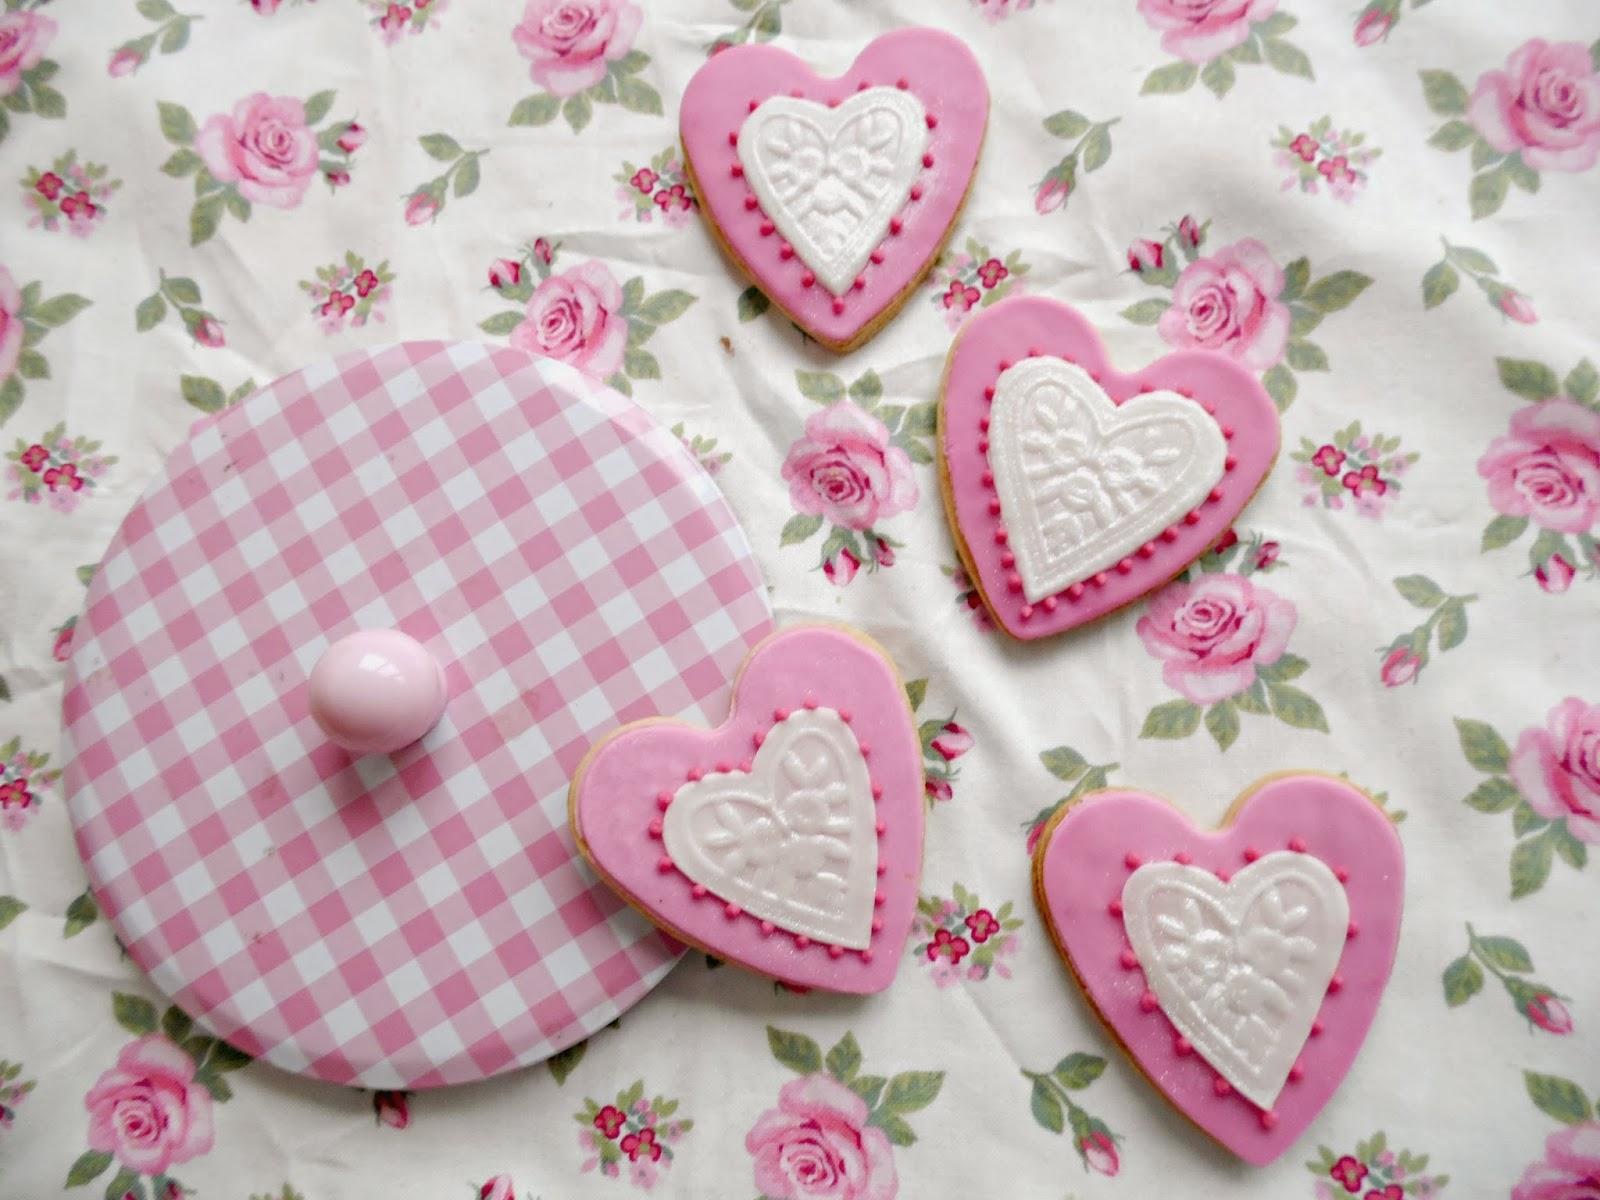 http://experimentando-enla-cocina.blogspot.com.es/2014/02/galletas-para-san-valentin-tutorial.html